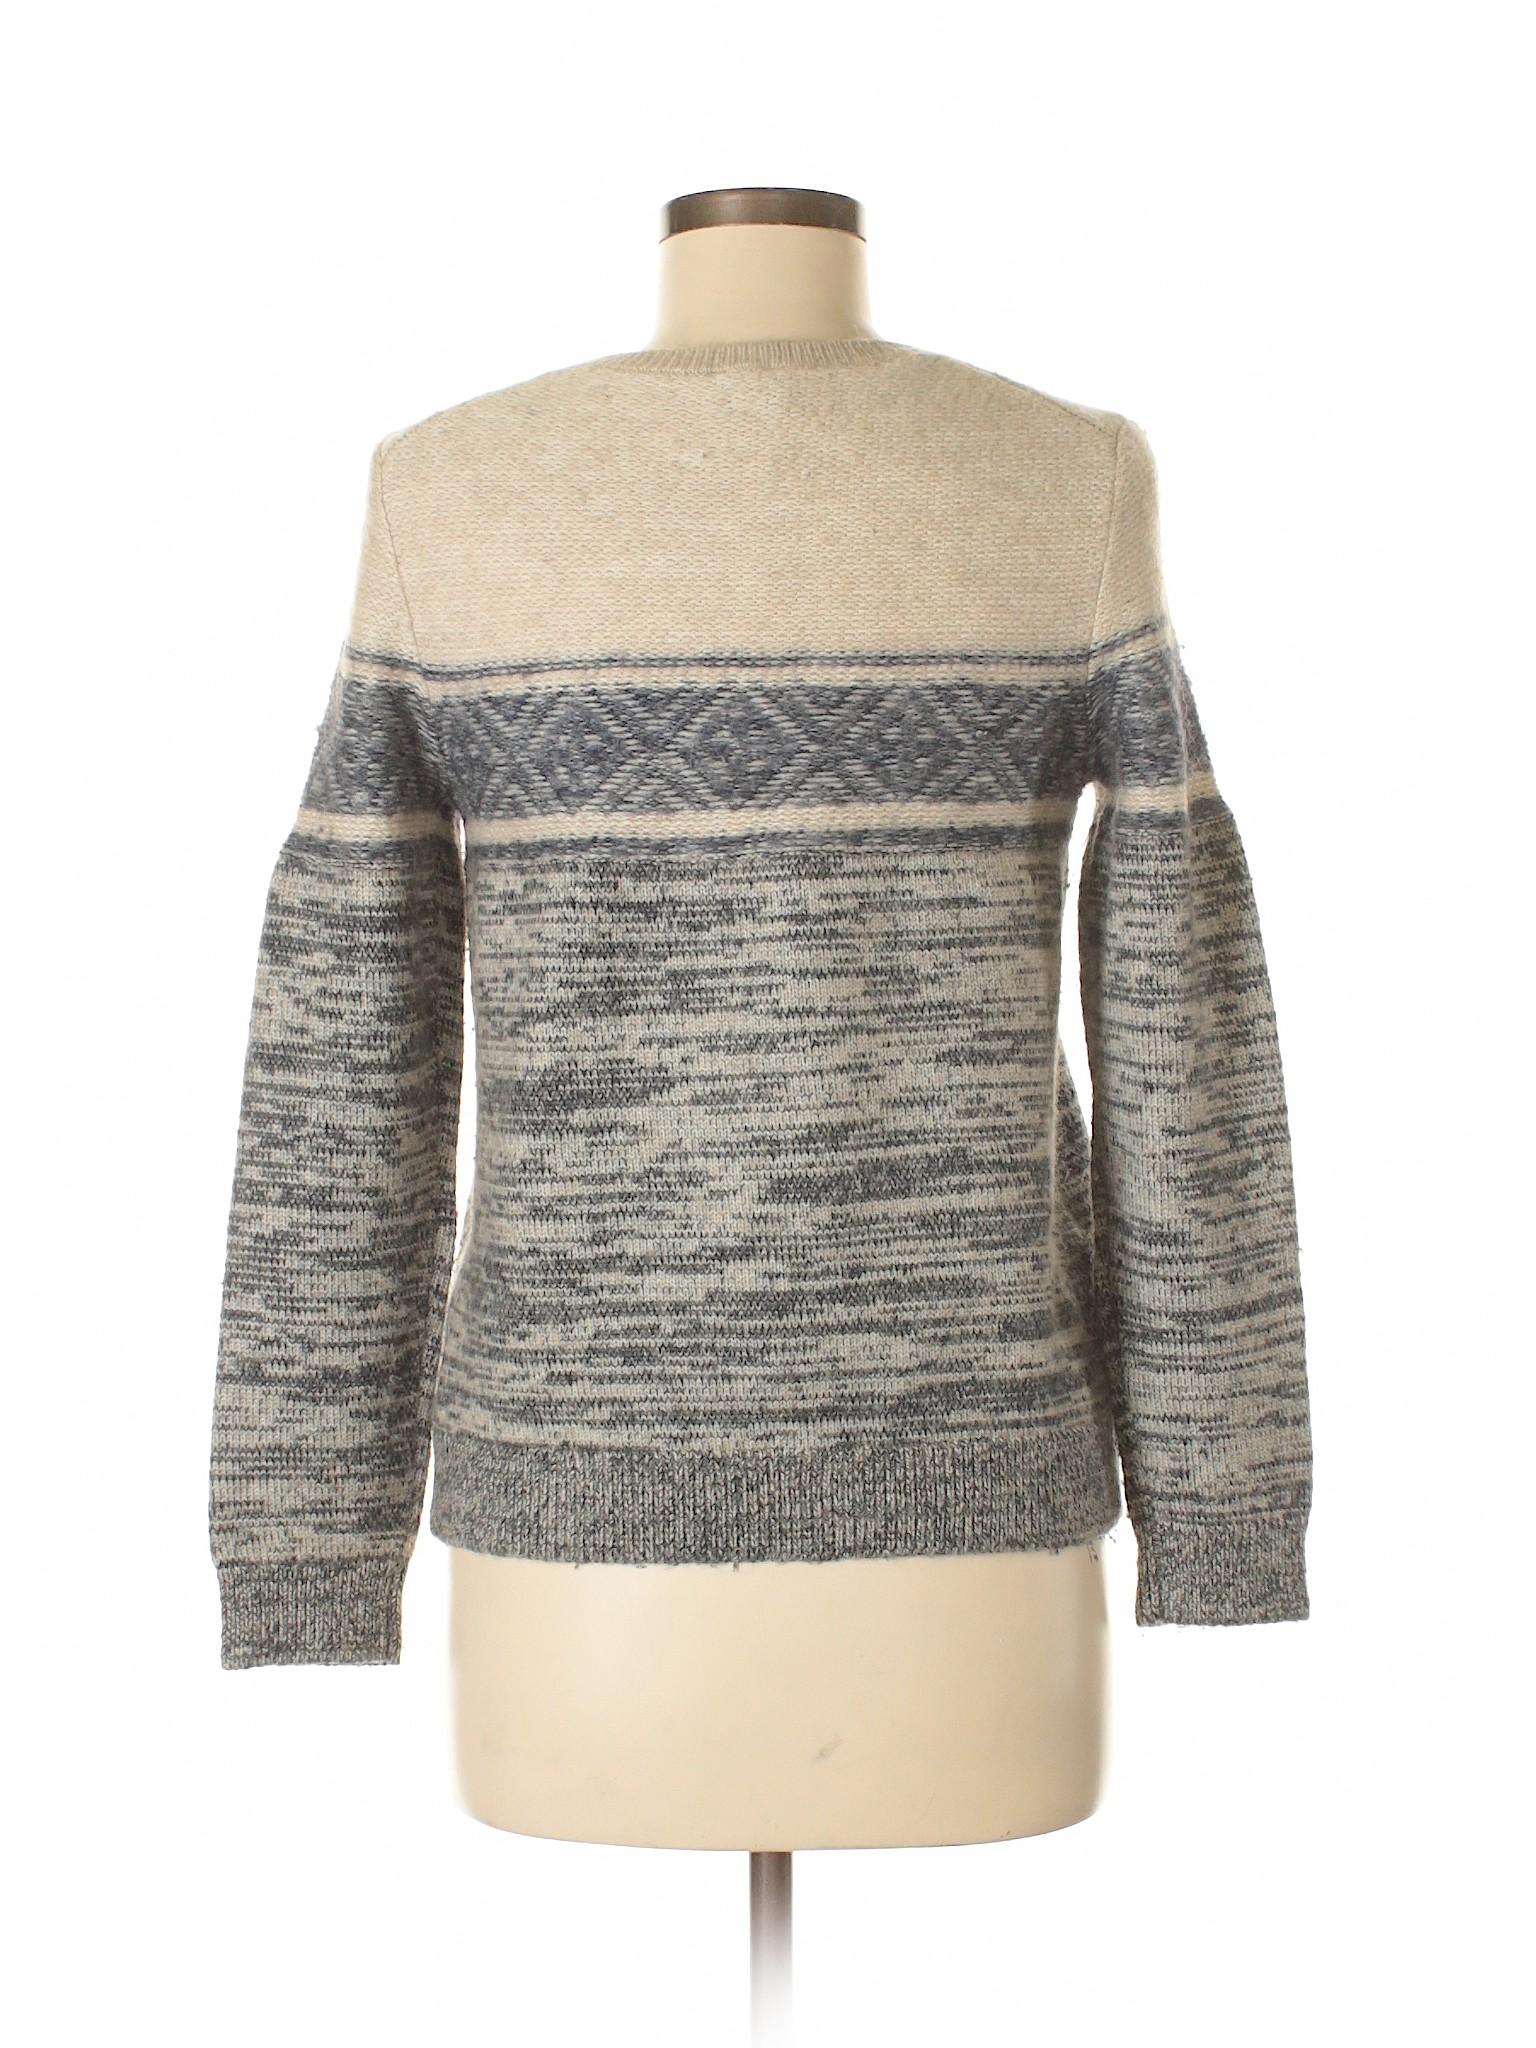 Gap Sweater Gap Boutique Sweater Boutique Boutique Pullover Pullover 5H1qww6t